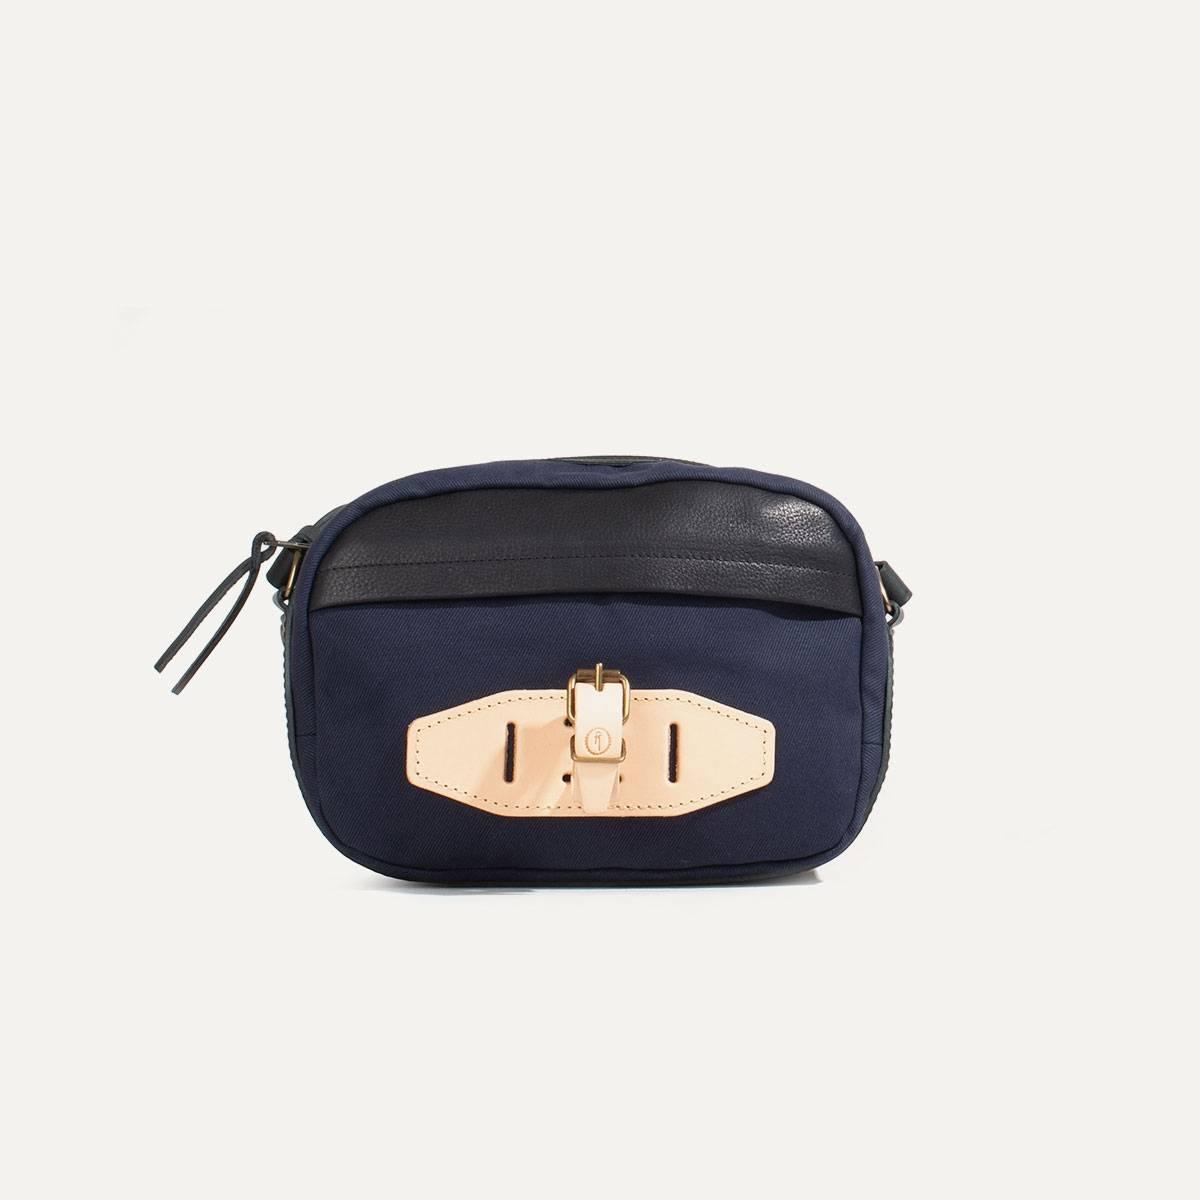 Honshu Belt bag - Navy / Black (image n°1)